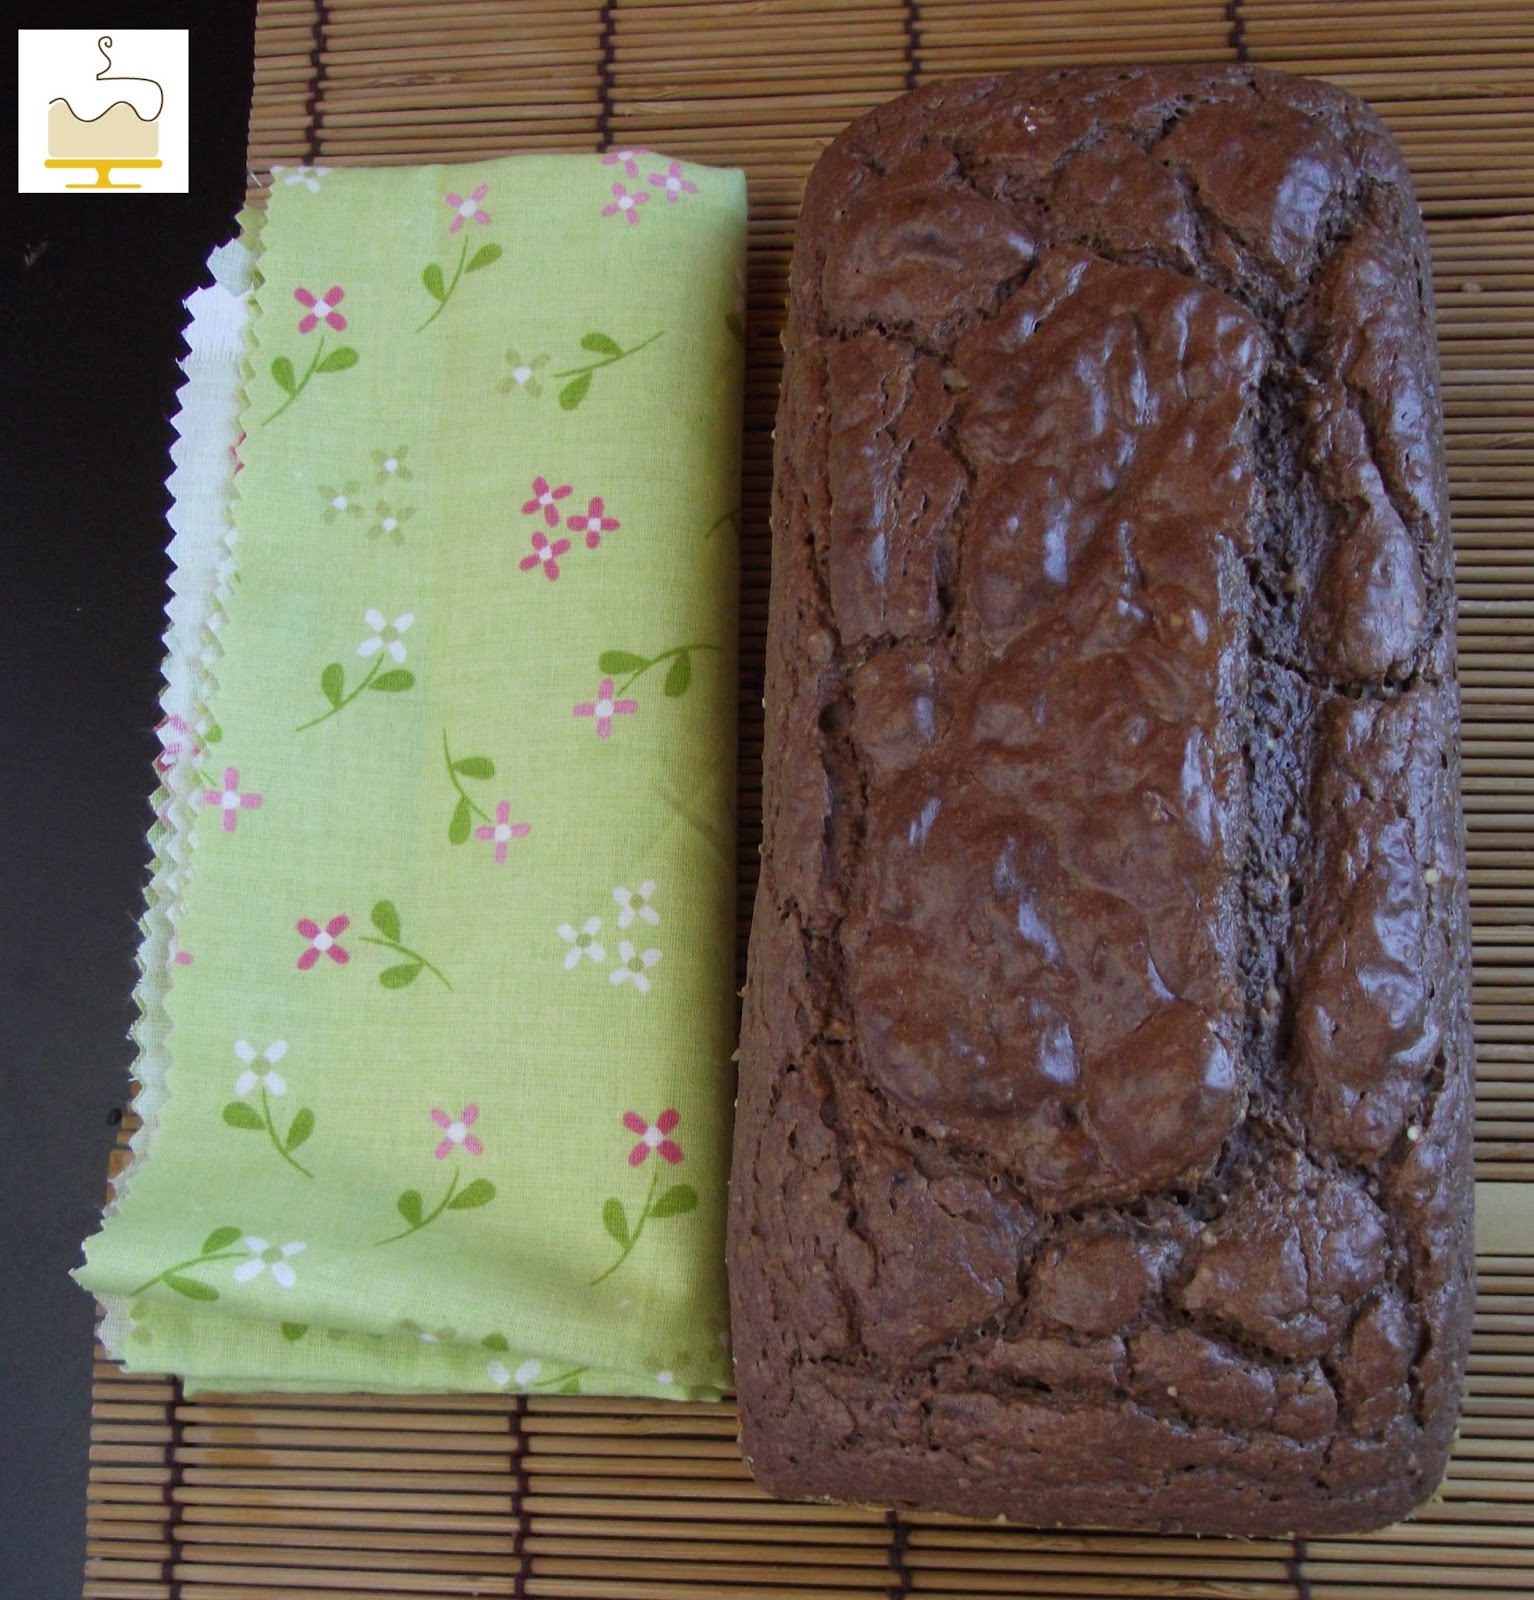 Pao de Farinha de Babacu Deli Art Cake Creations